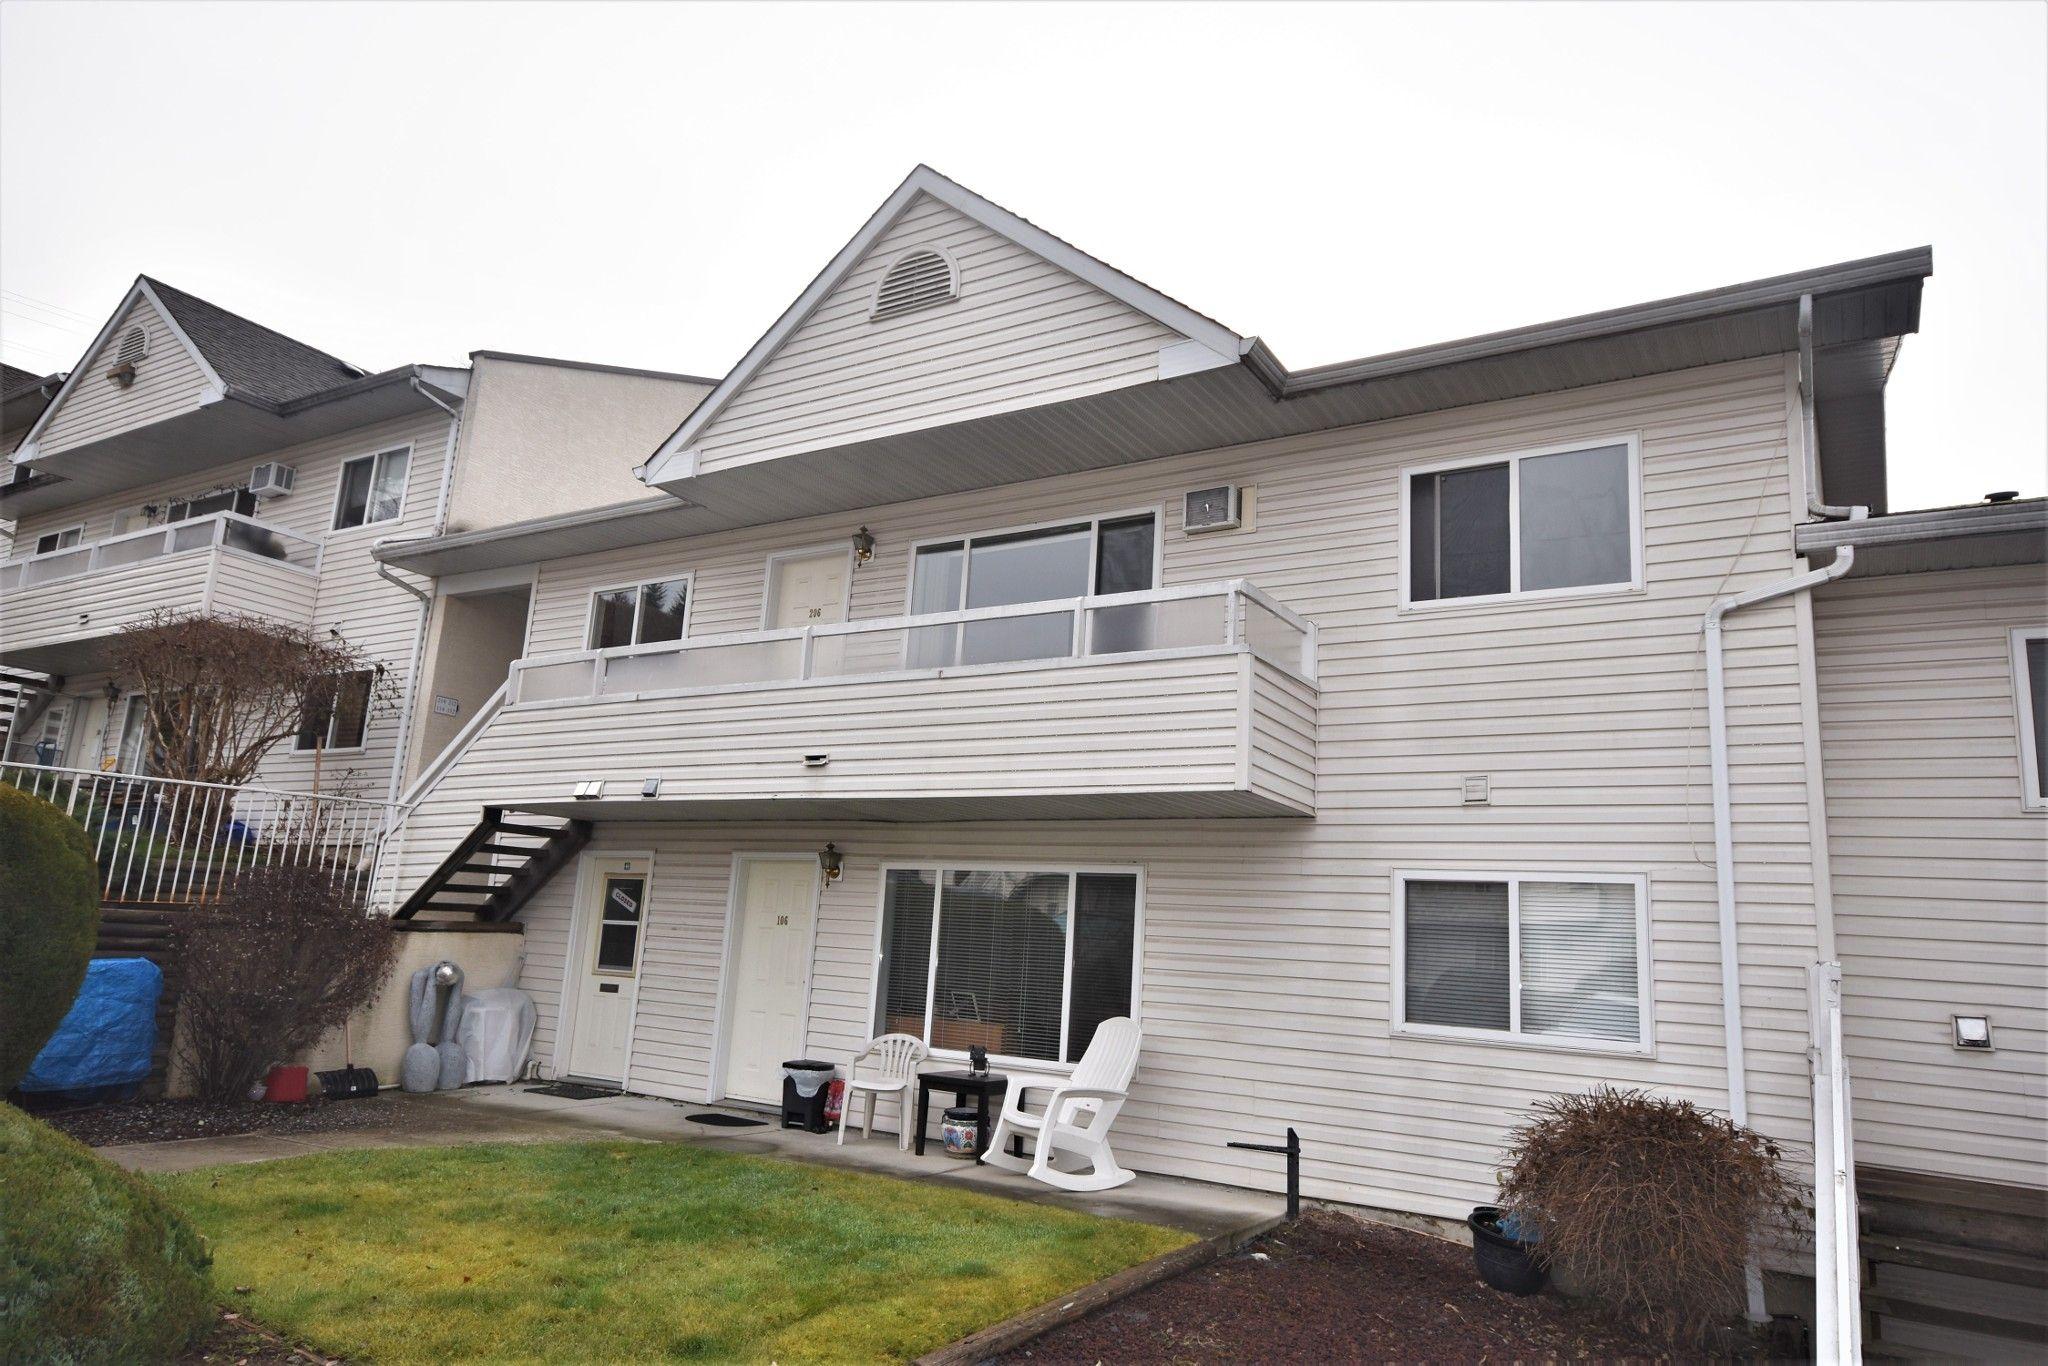 Main Photo: 202 506 Browne Road in Vernon: City of Vernon House for sale (North Okanagan)  : MLS®# 10195155